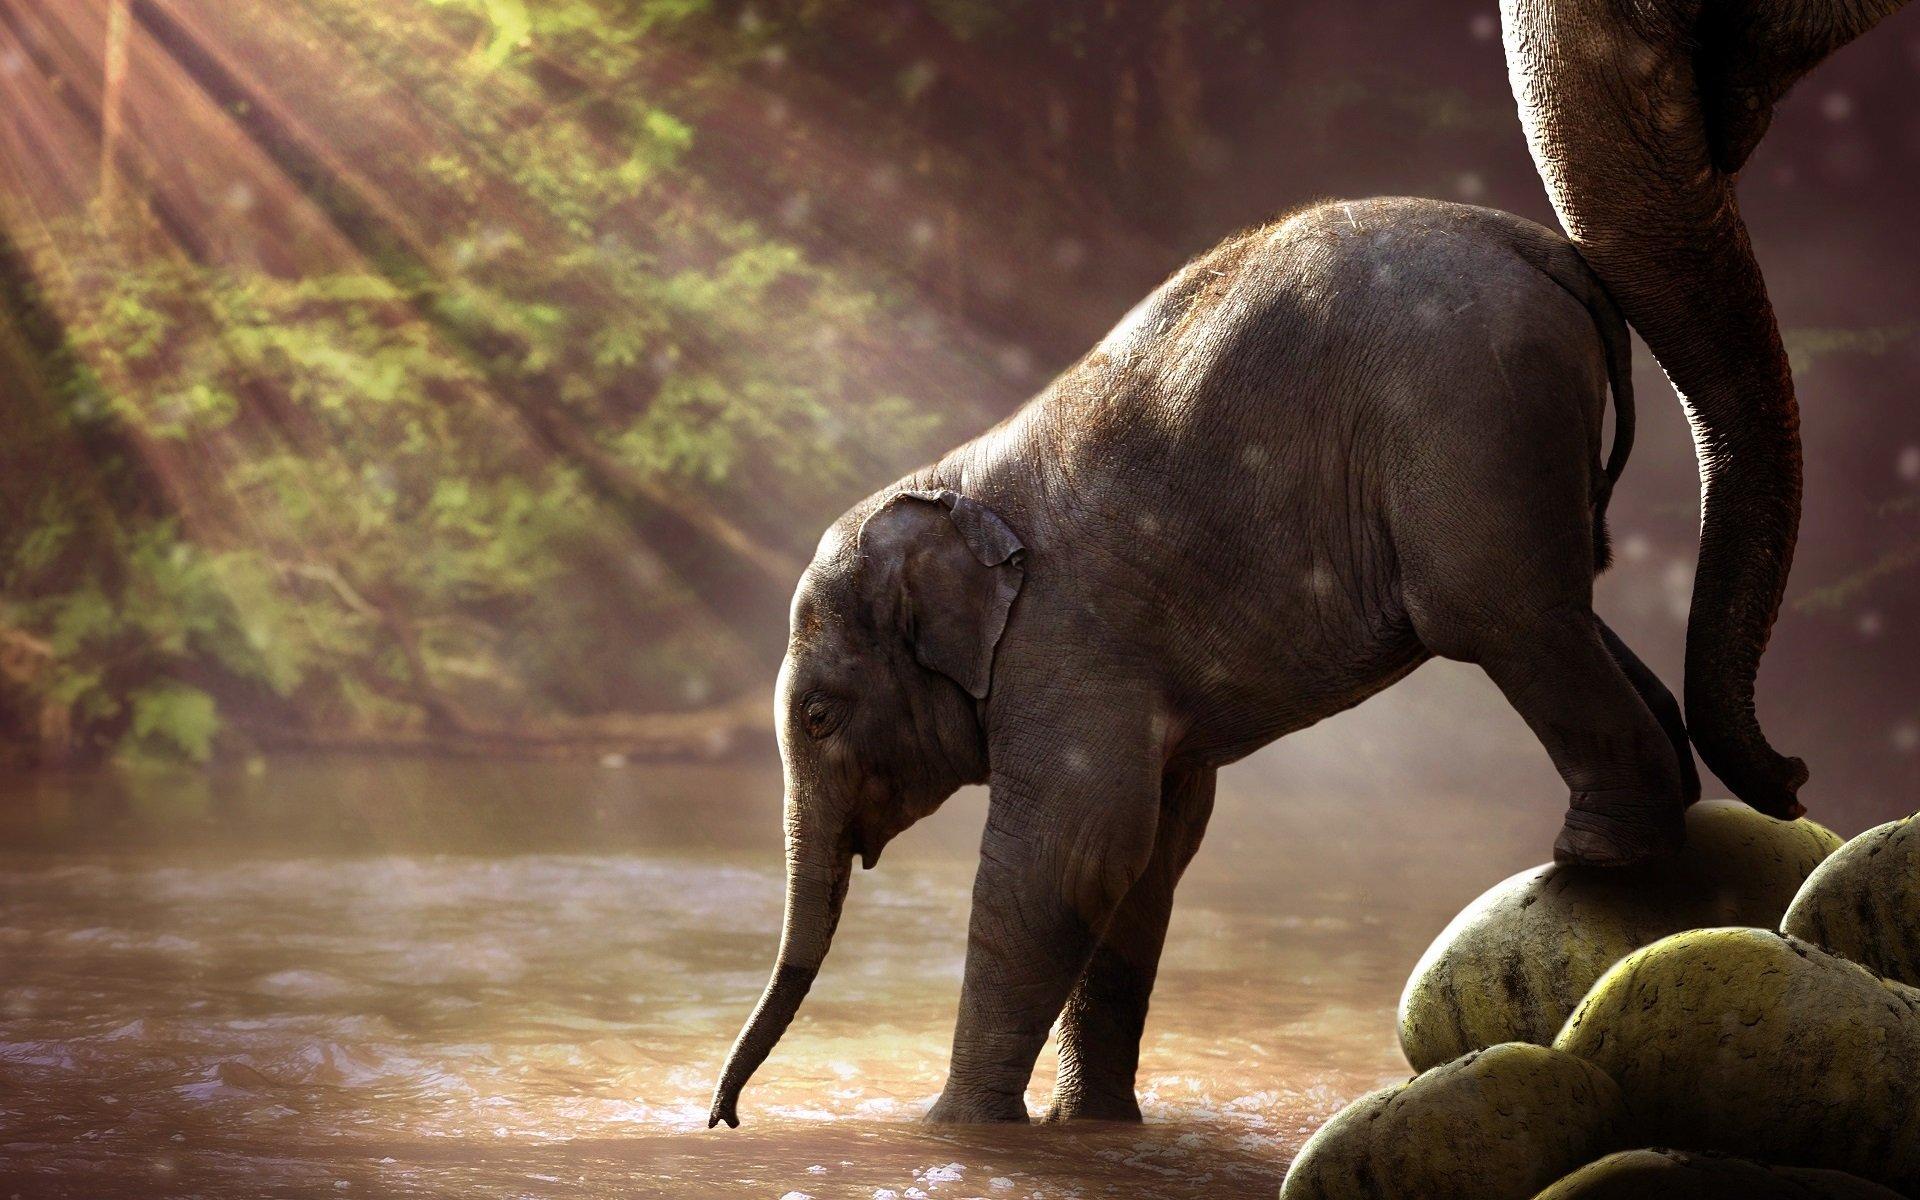 Fond D Ecran 1920 X 1200 Px Des Bebes Animaux Elephant